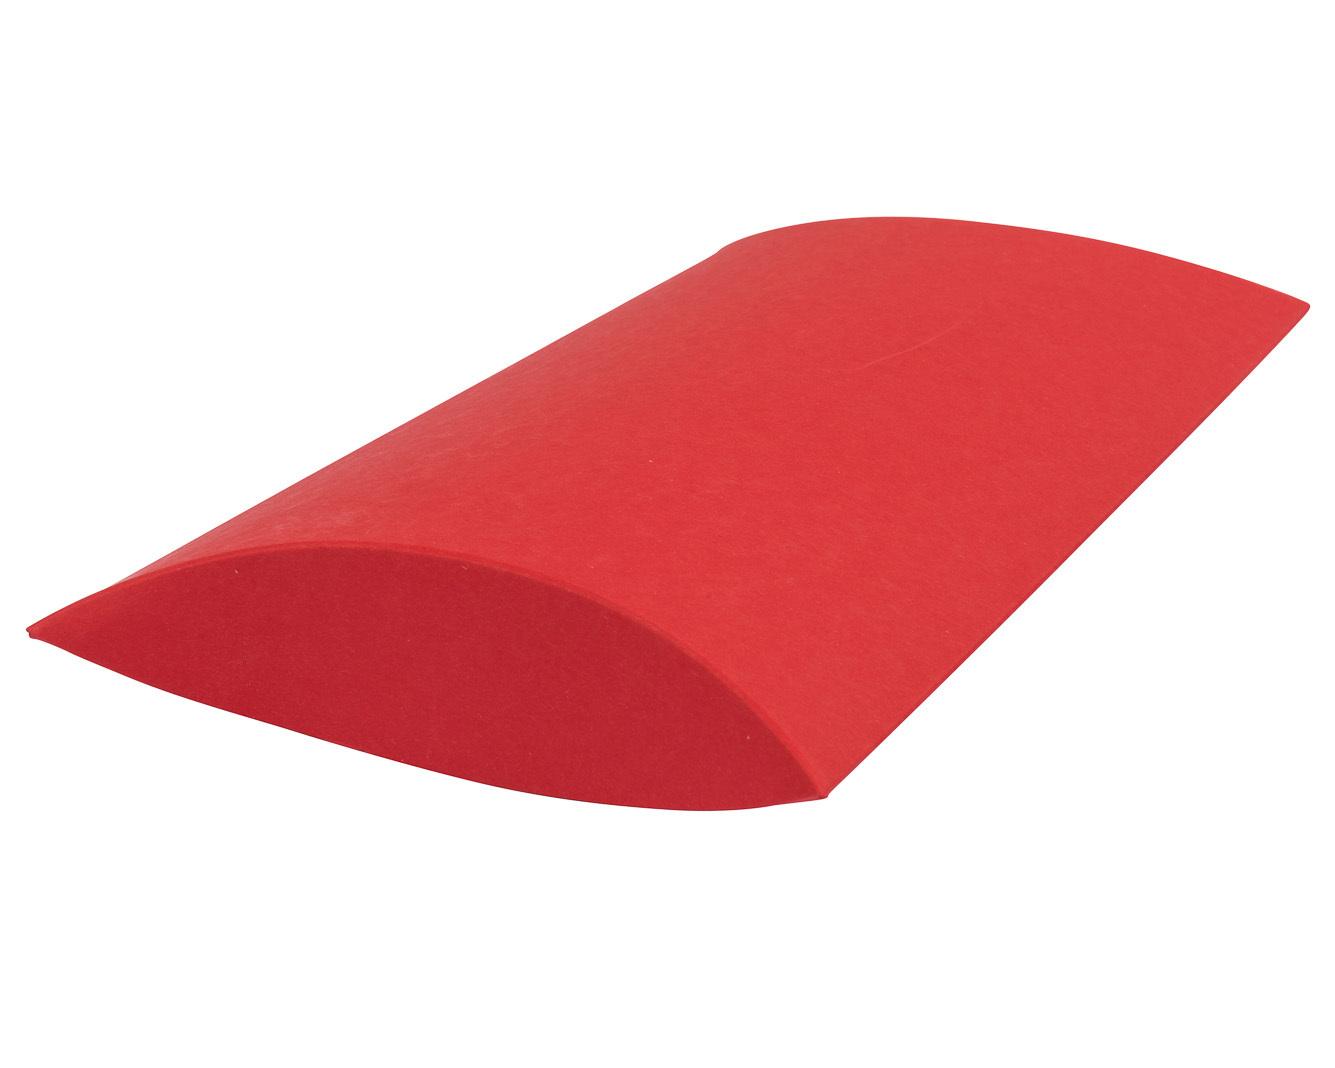 BUNTBOX Pillow Box M - Ruby